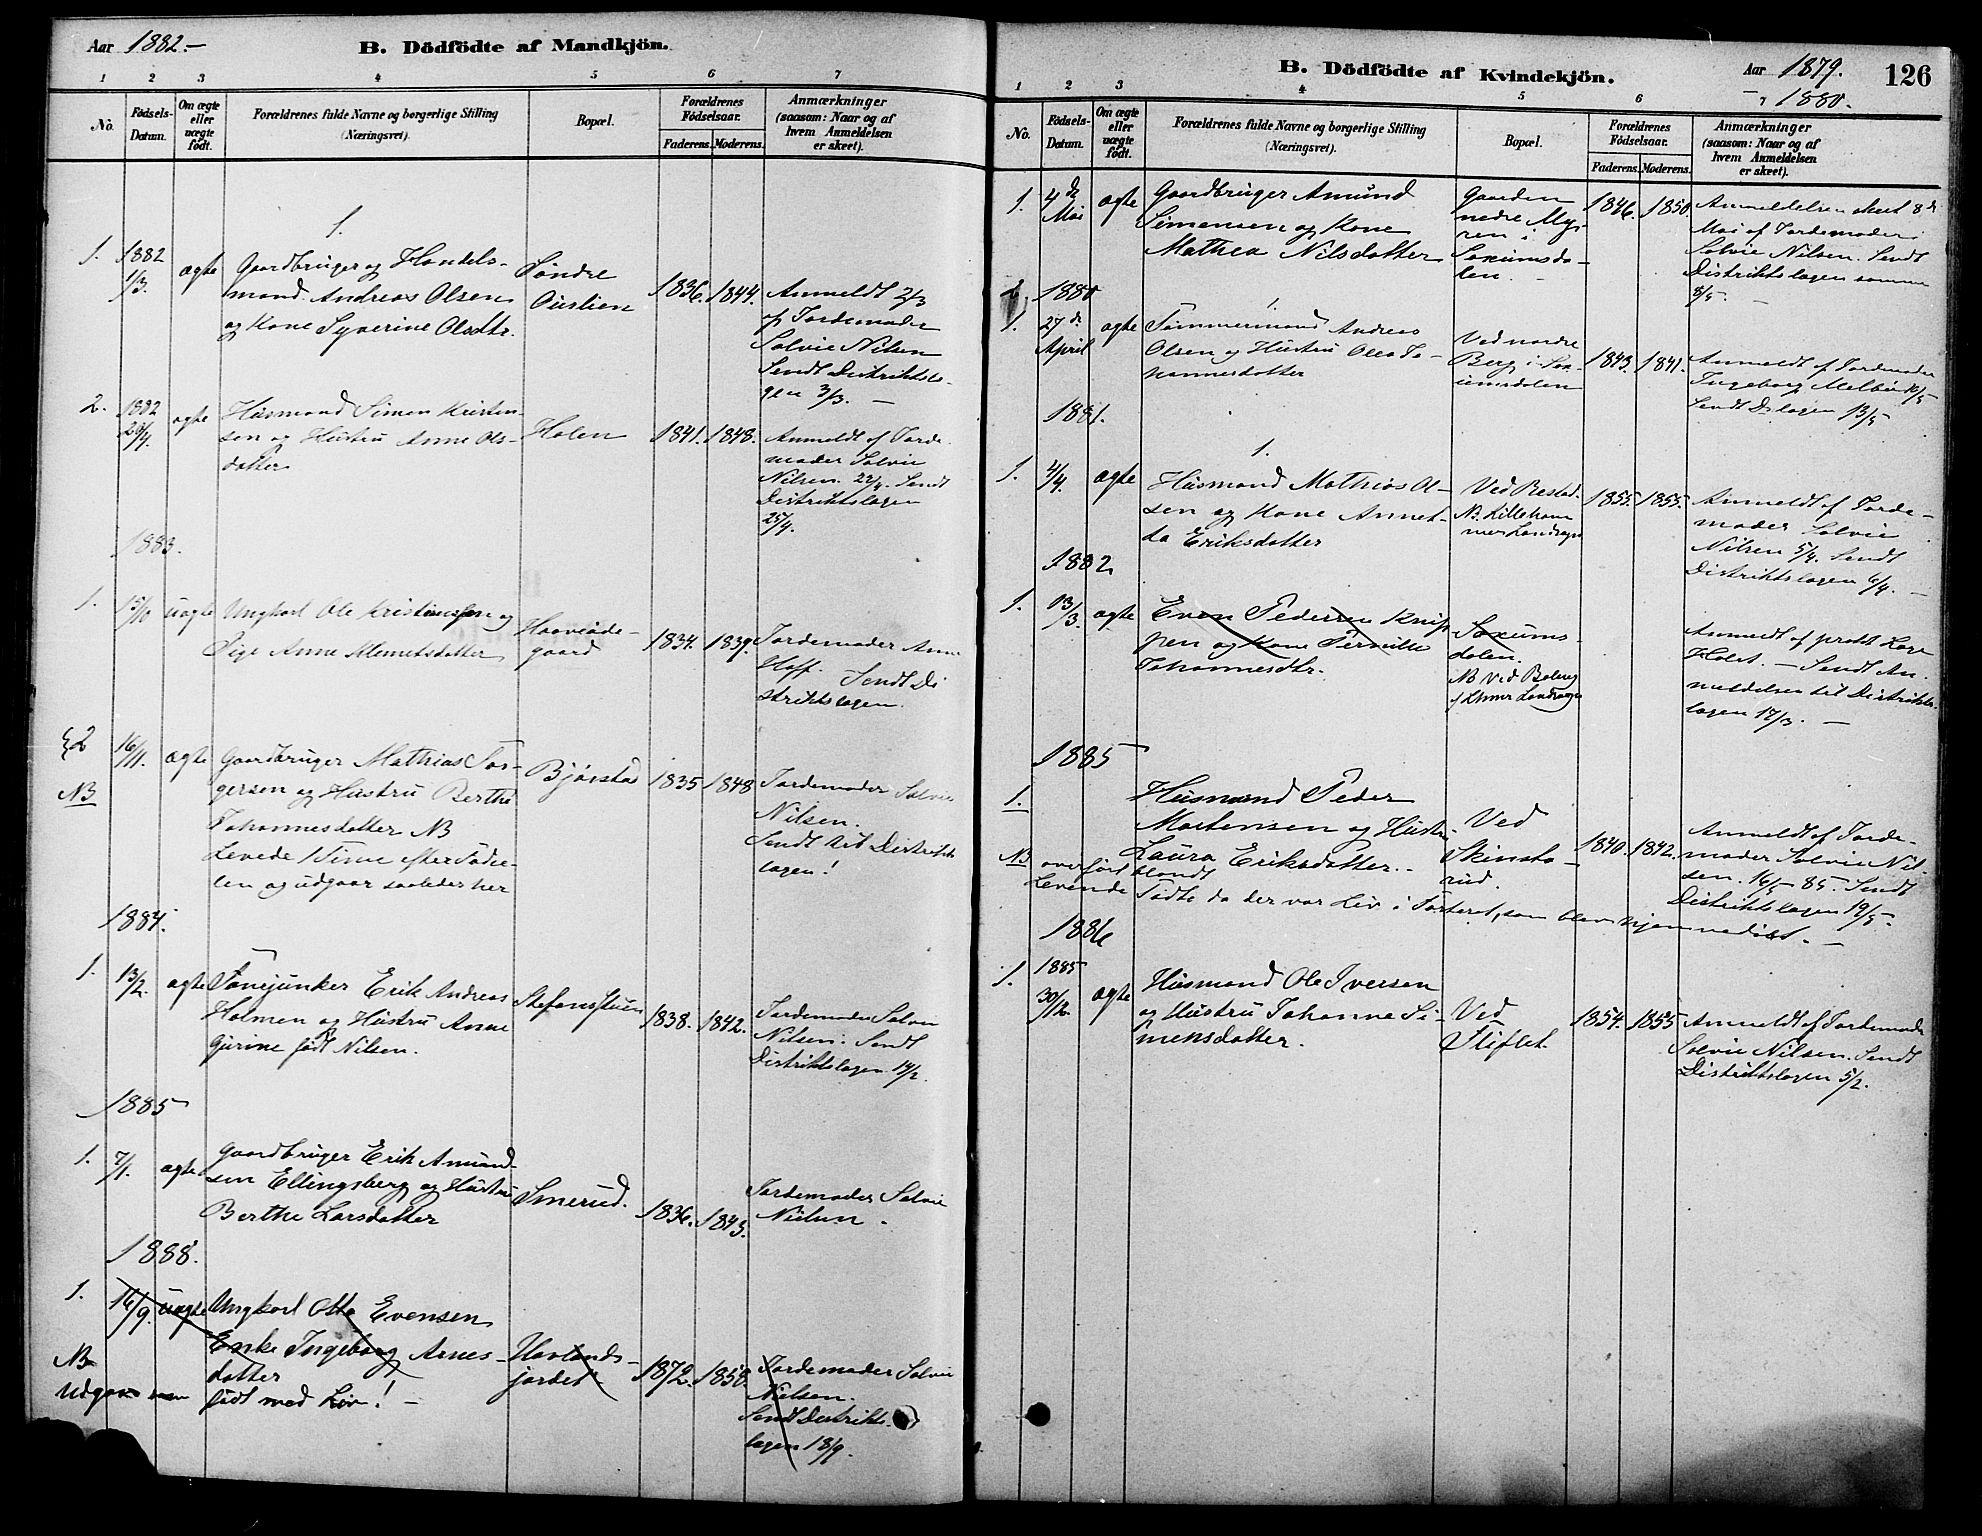 SAH, Fåberg prestekontor, Ministerialbok nr. 8, 1879-1898, s. 126